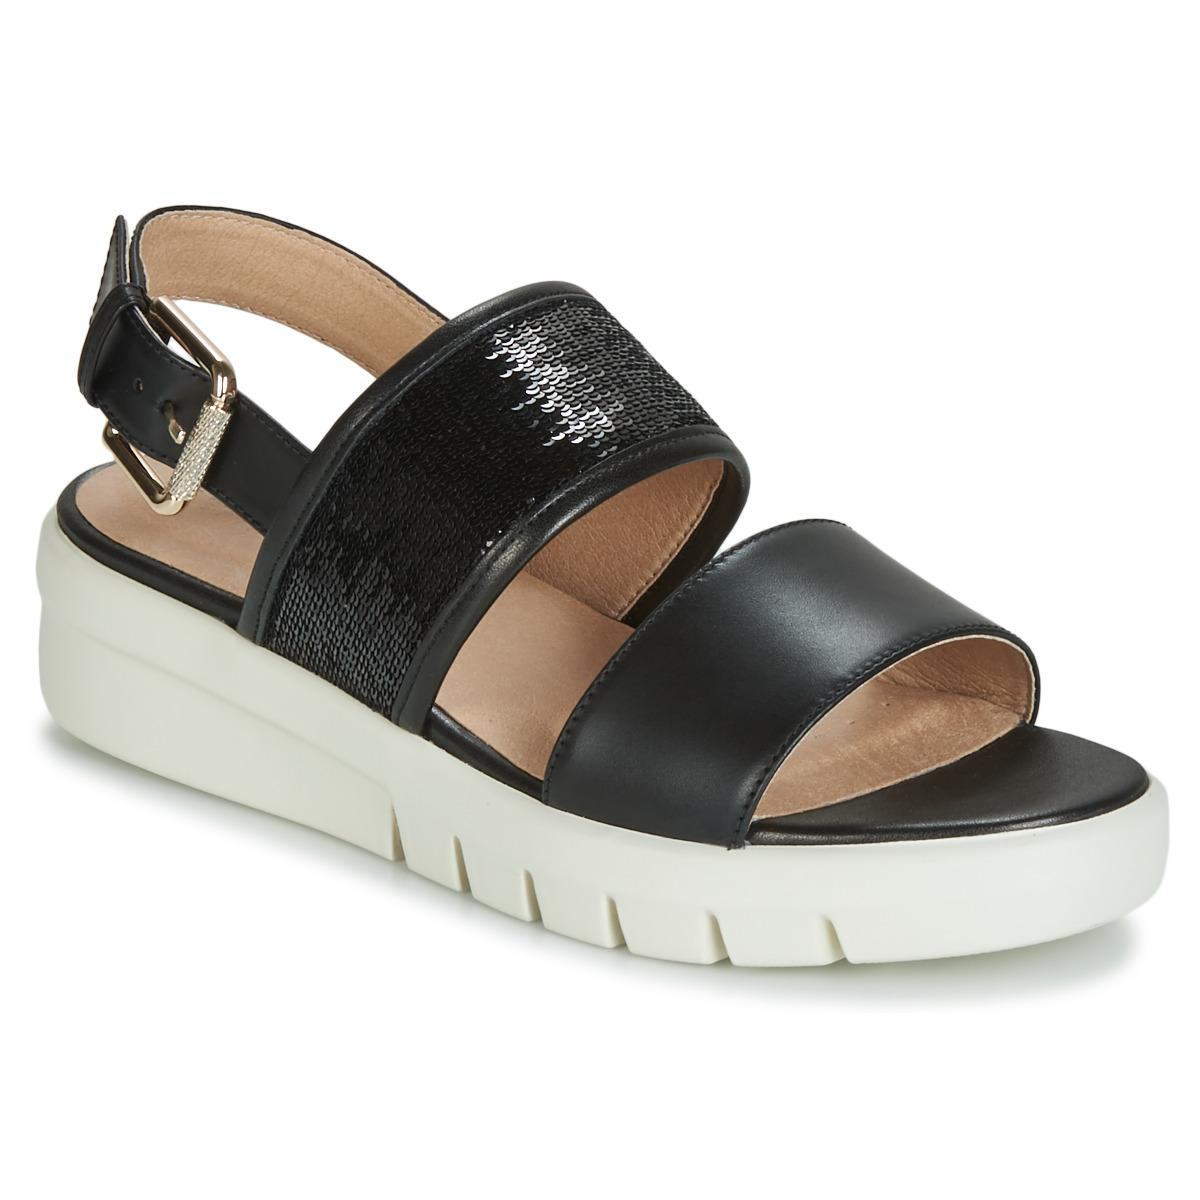 80043d4561b Geox D Wimbley Sandal Sandals in Black - Lyst